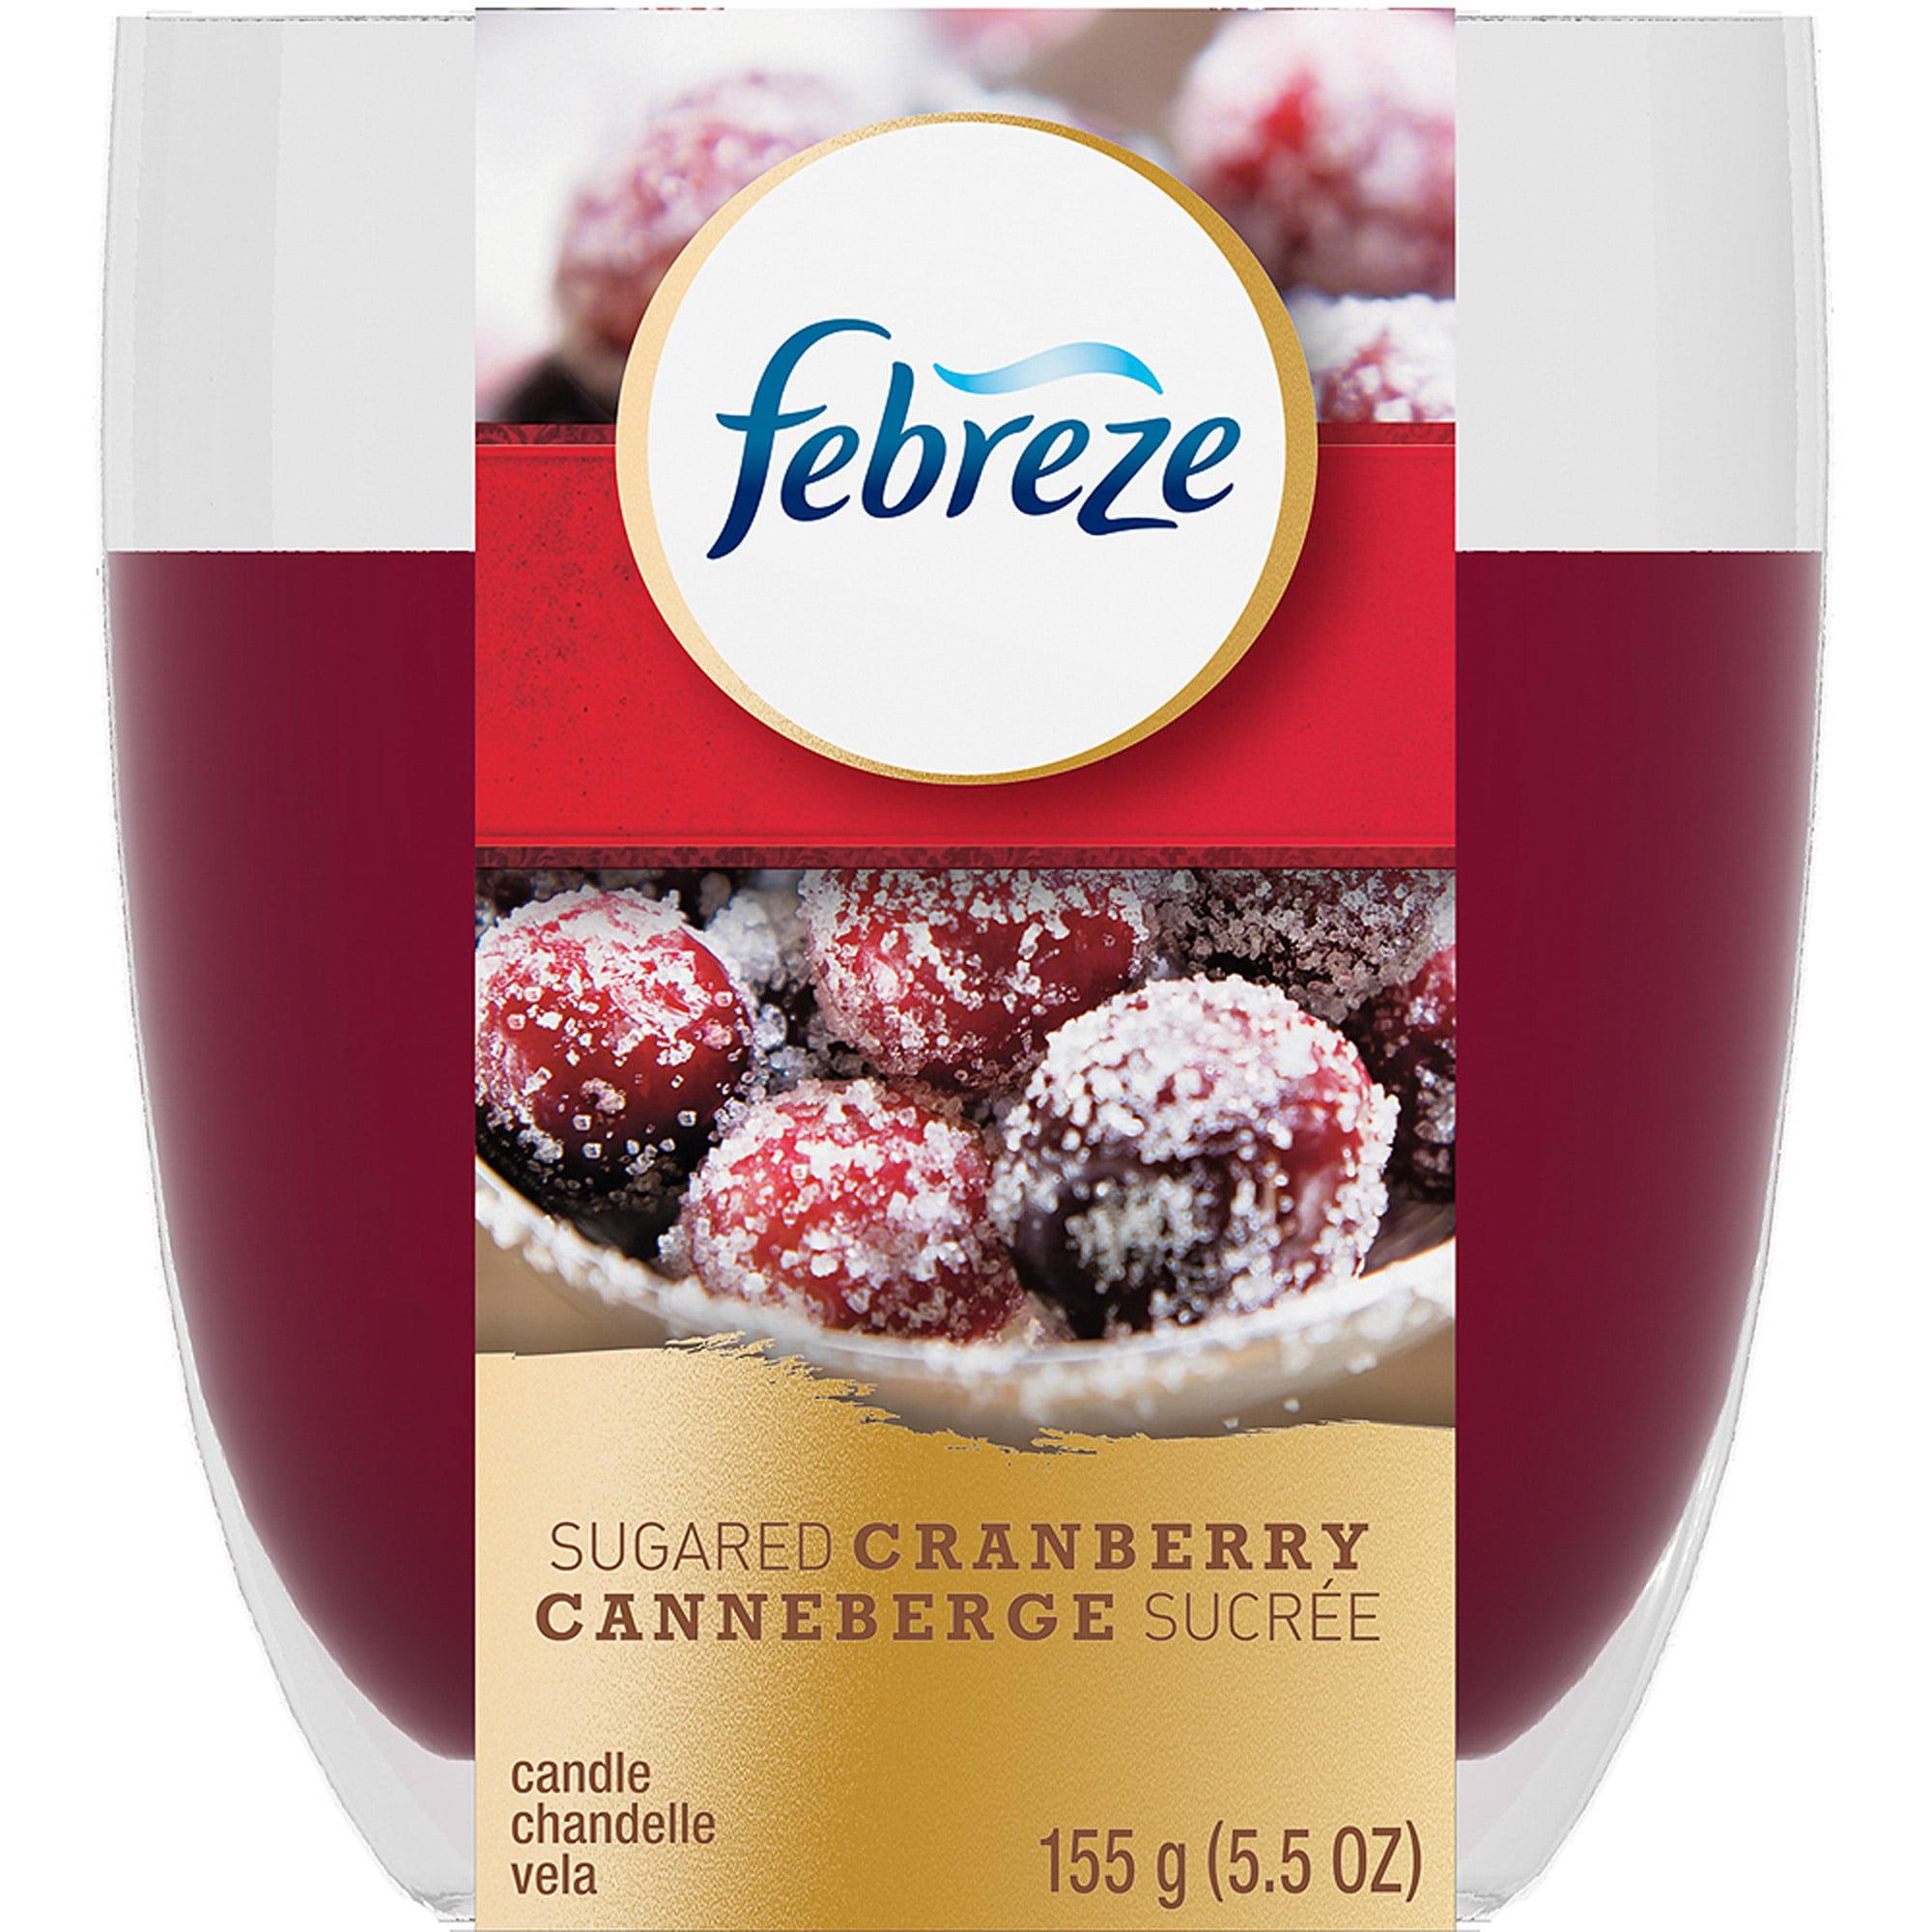 Febreze Candle Sugared Cranberry Air Freshener, 5.5 oz